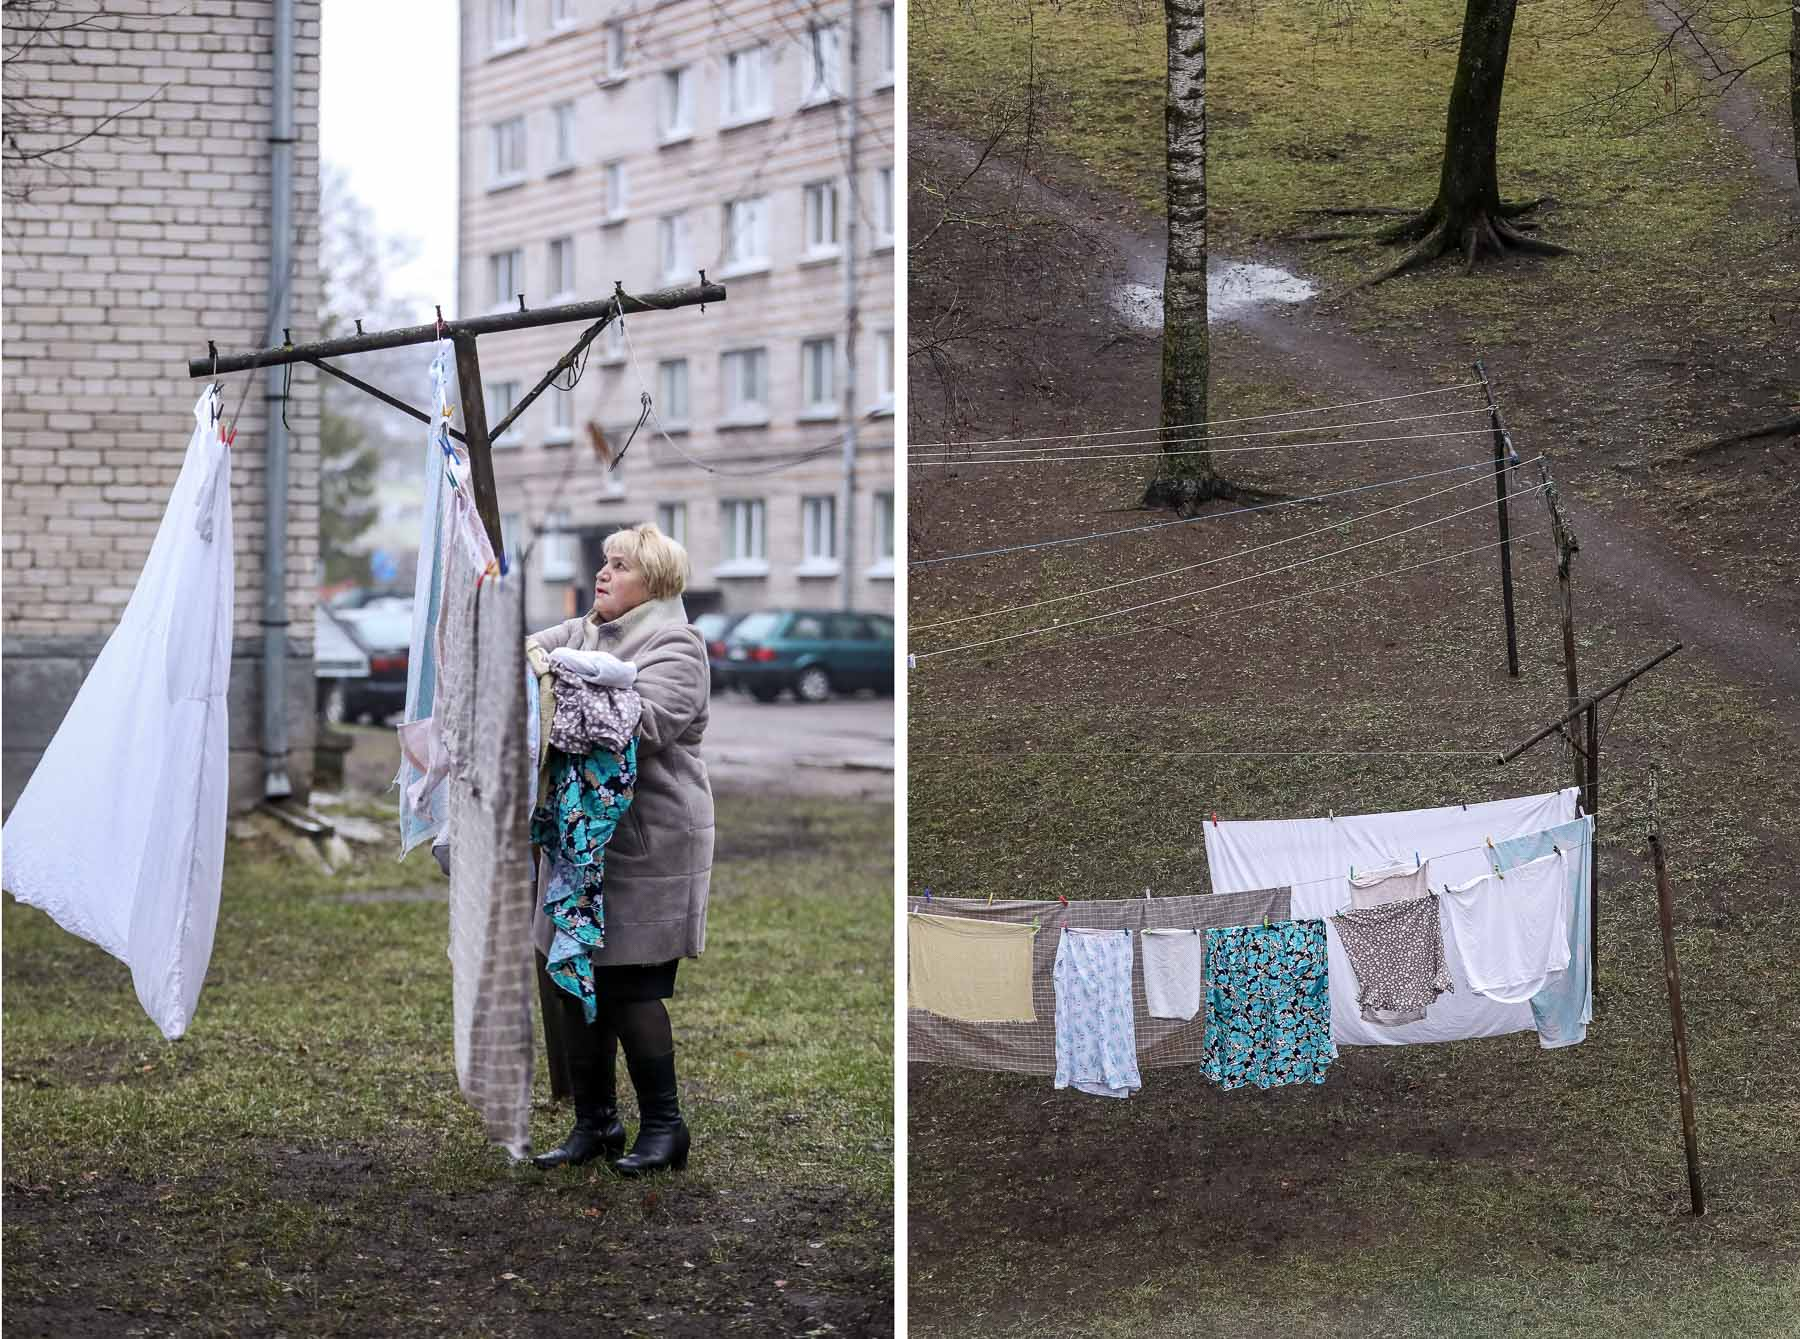 Landscape-cityscape-photography-jelgava-latvia-blocs-blocks-flat-post-soviet--Советские-квартиры-спальный-район-Латвия-город-фотограф-natalia-smith-photography-0113.jpg